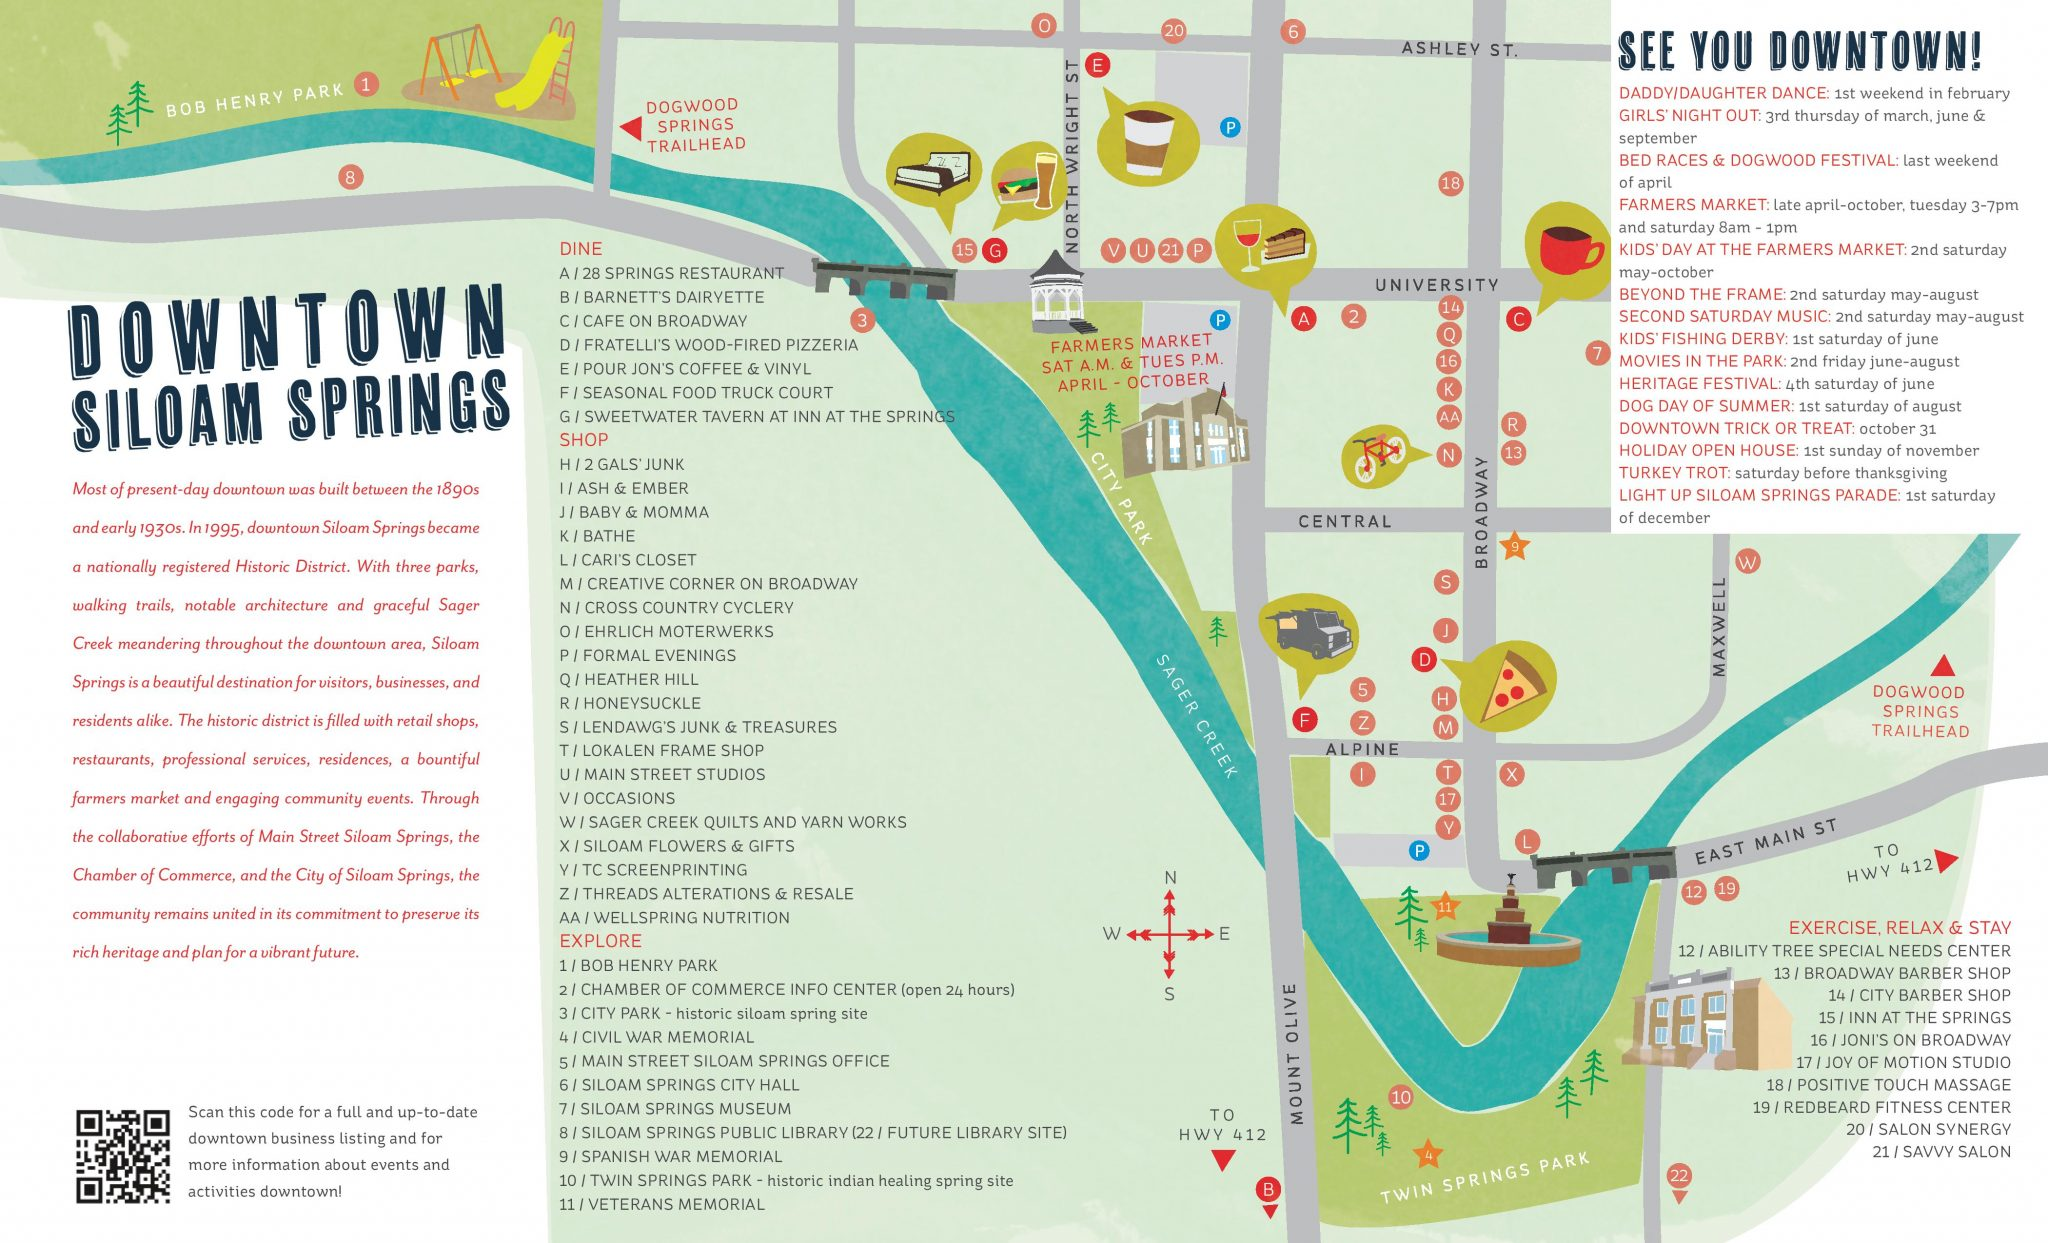 2016 Siloam Springs Brochure